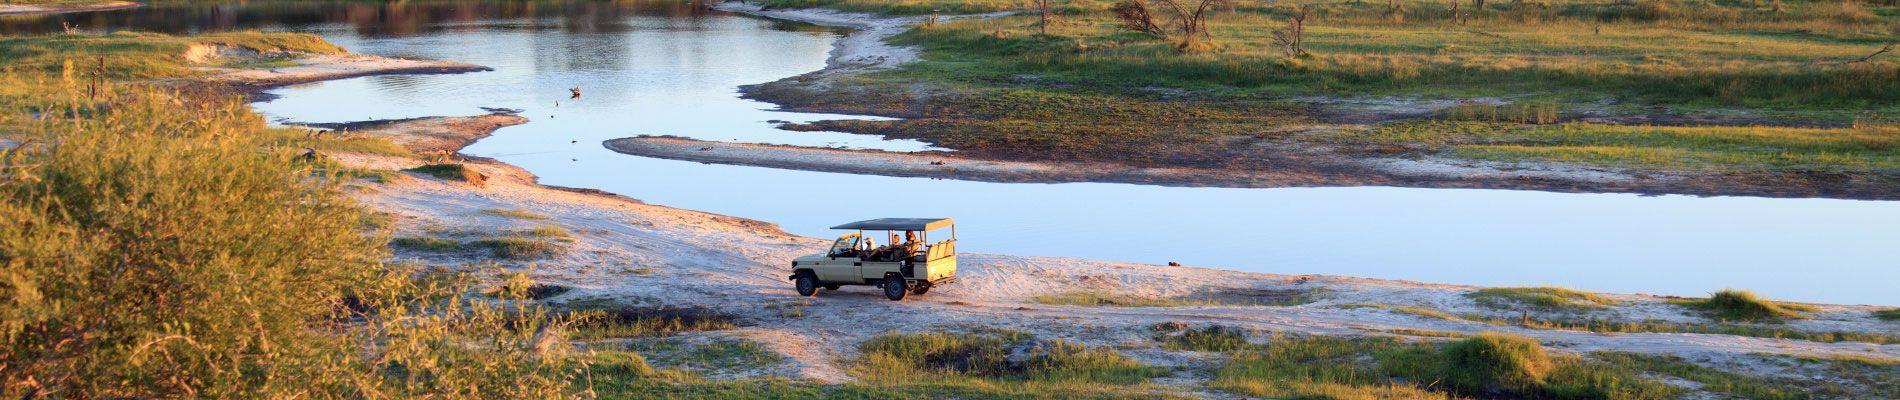 afrique-botswana-safari-st